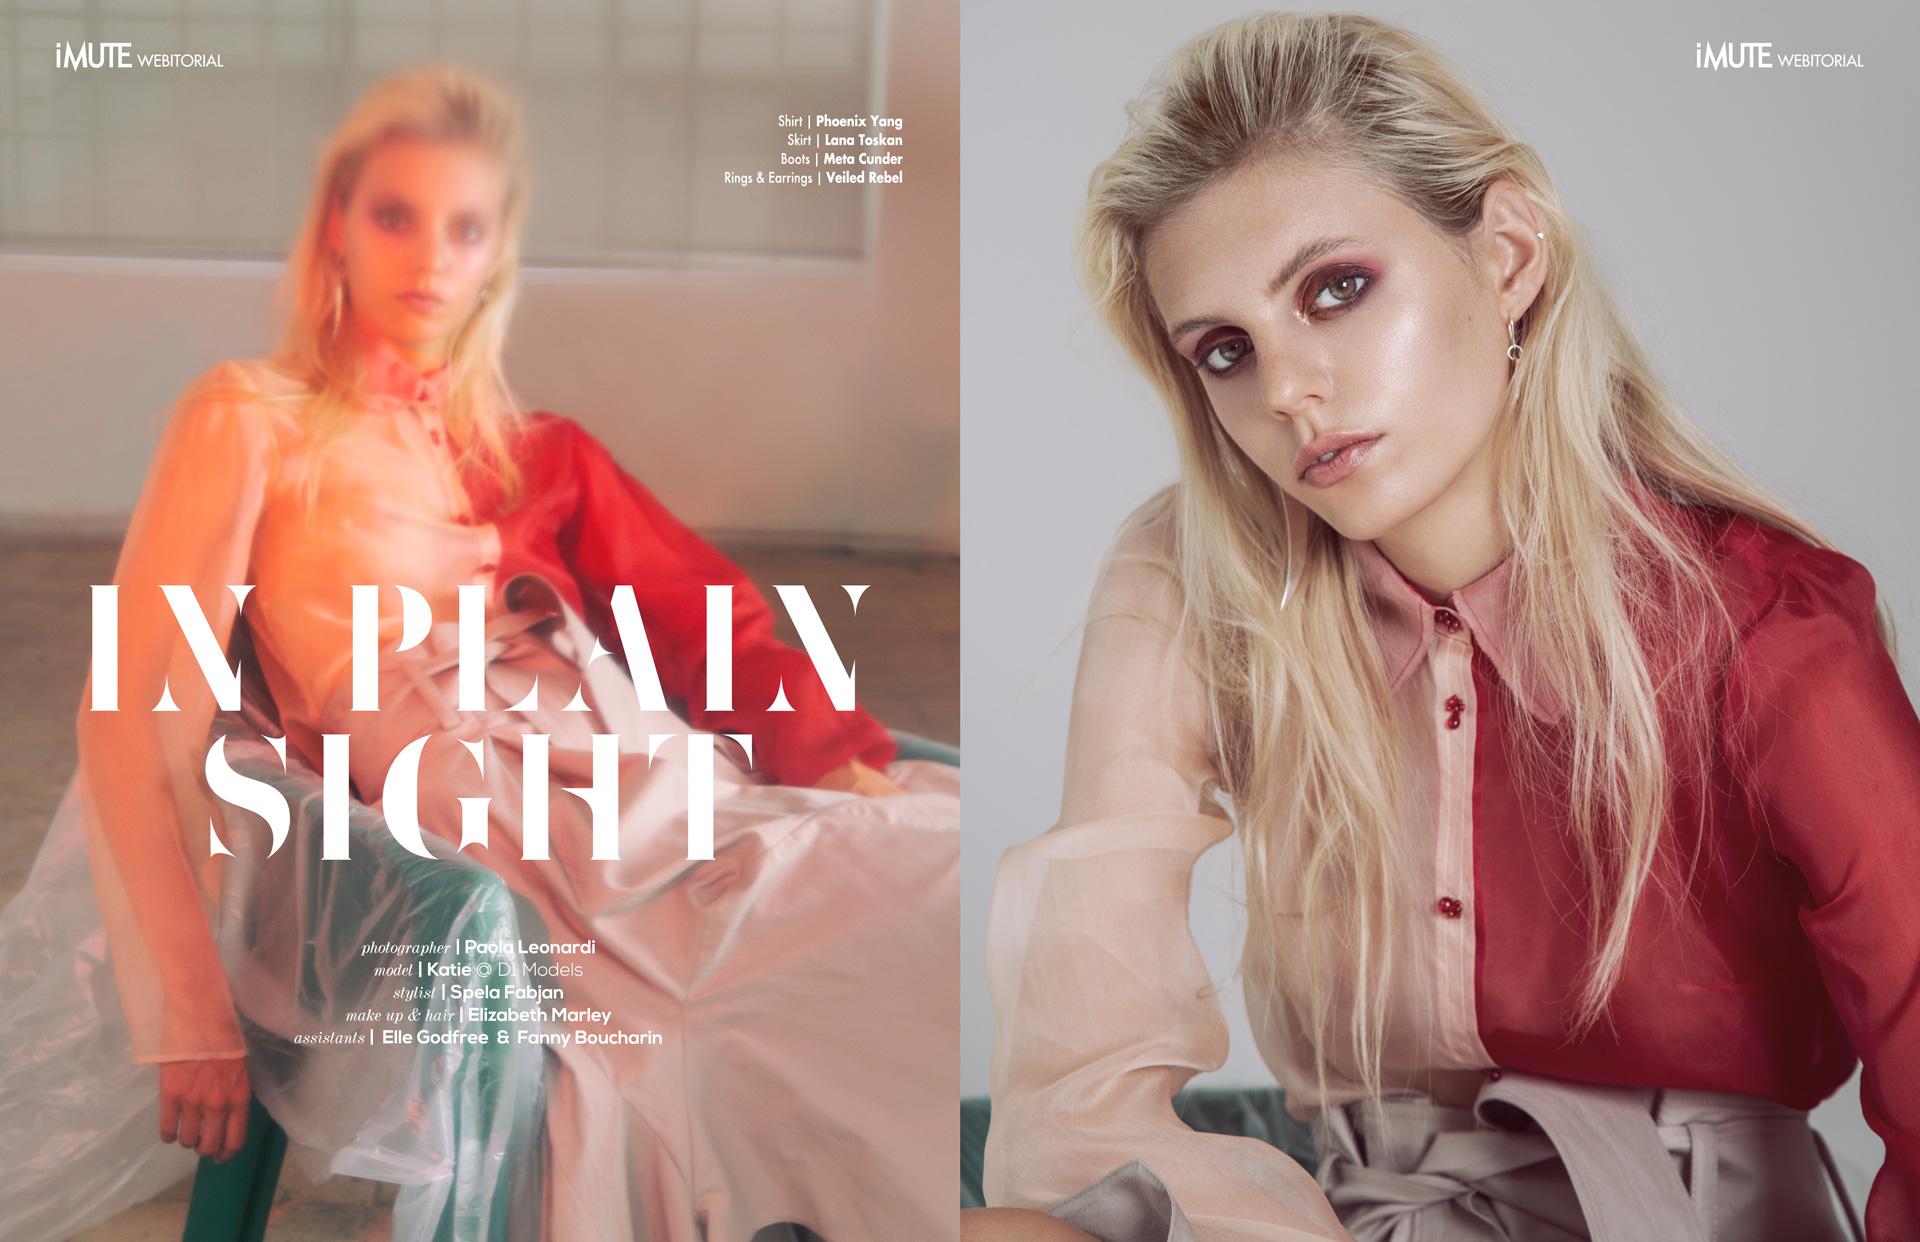 IN-PLAIN-SIGHT-webitorial-for-iMute-Magazine.jpg